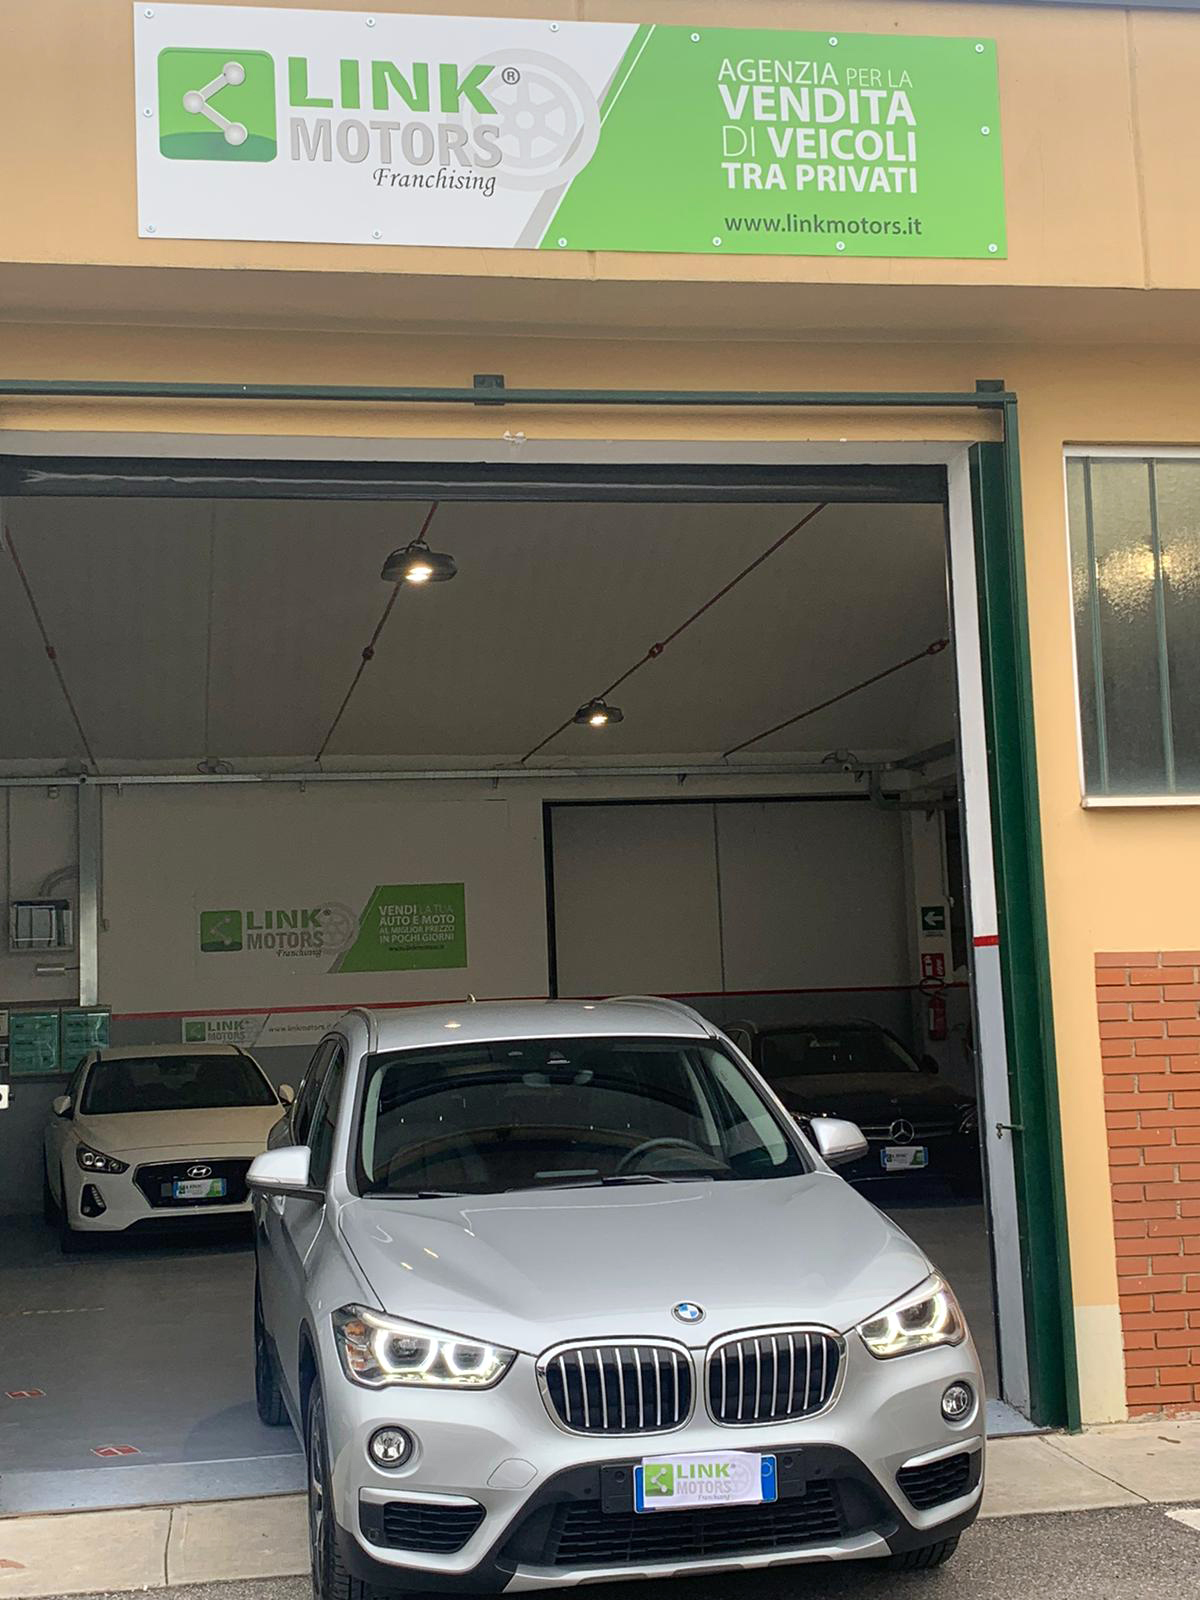 FIATSCUDO | Link Motors Franchising